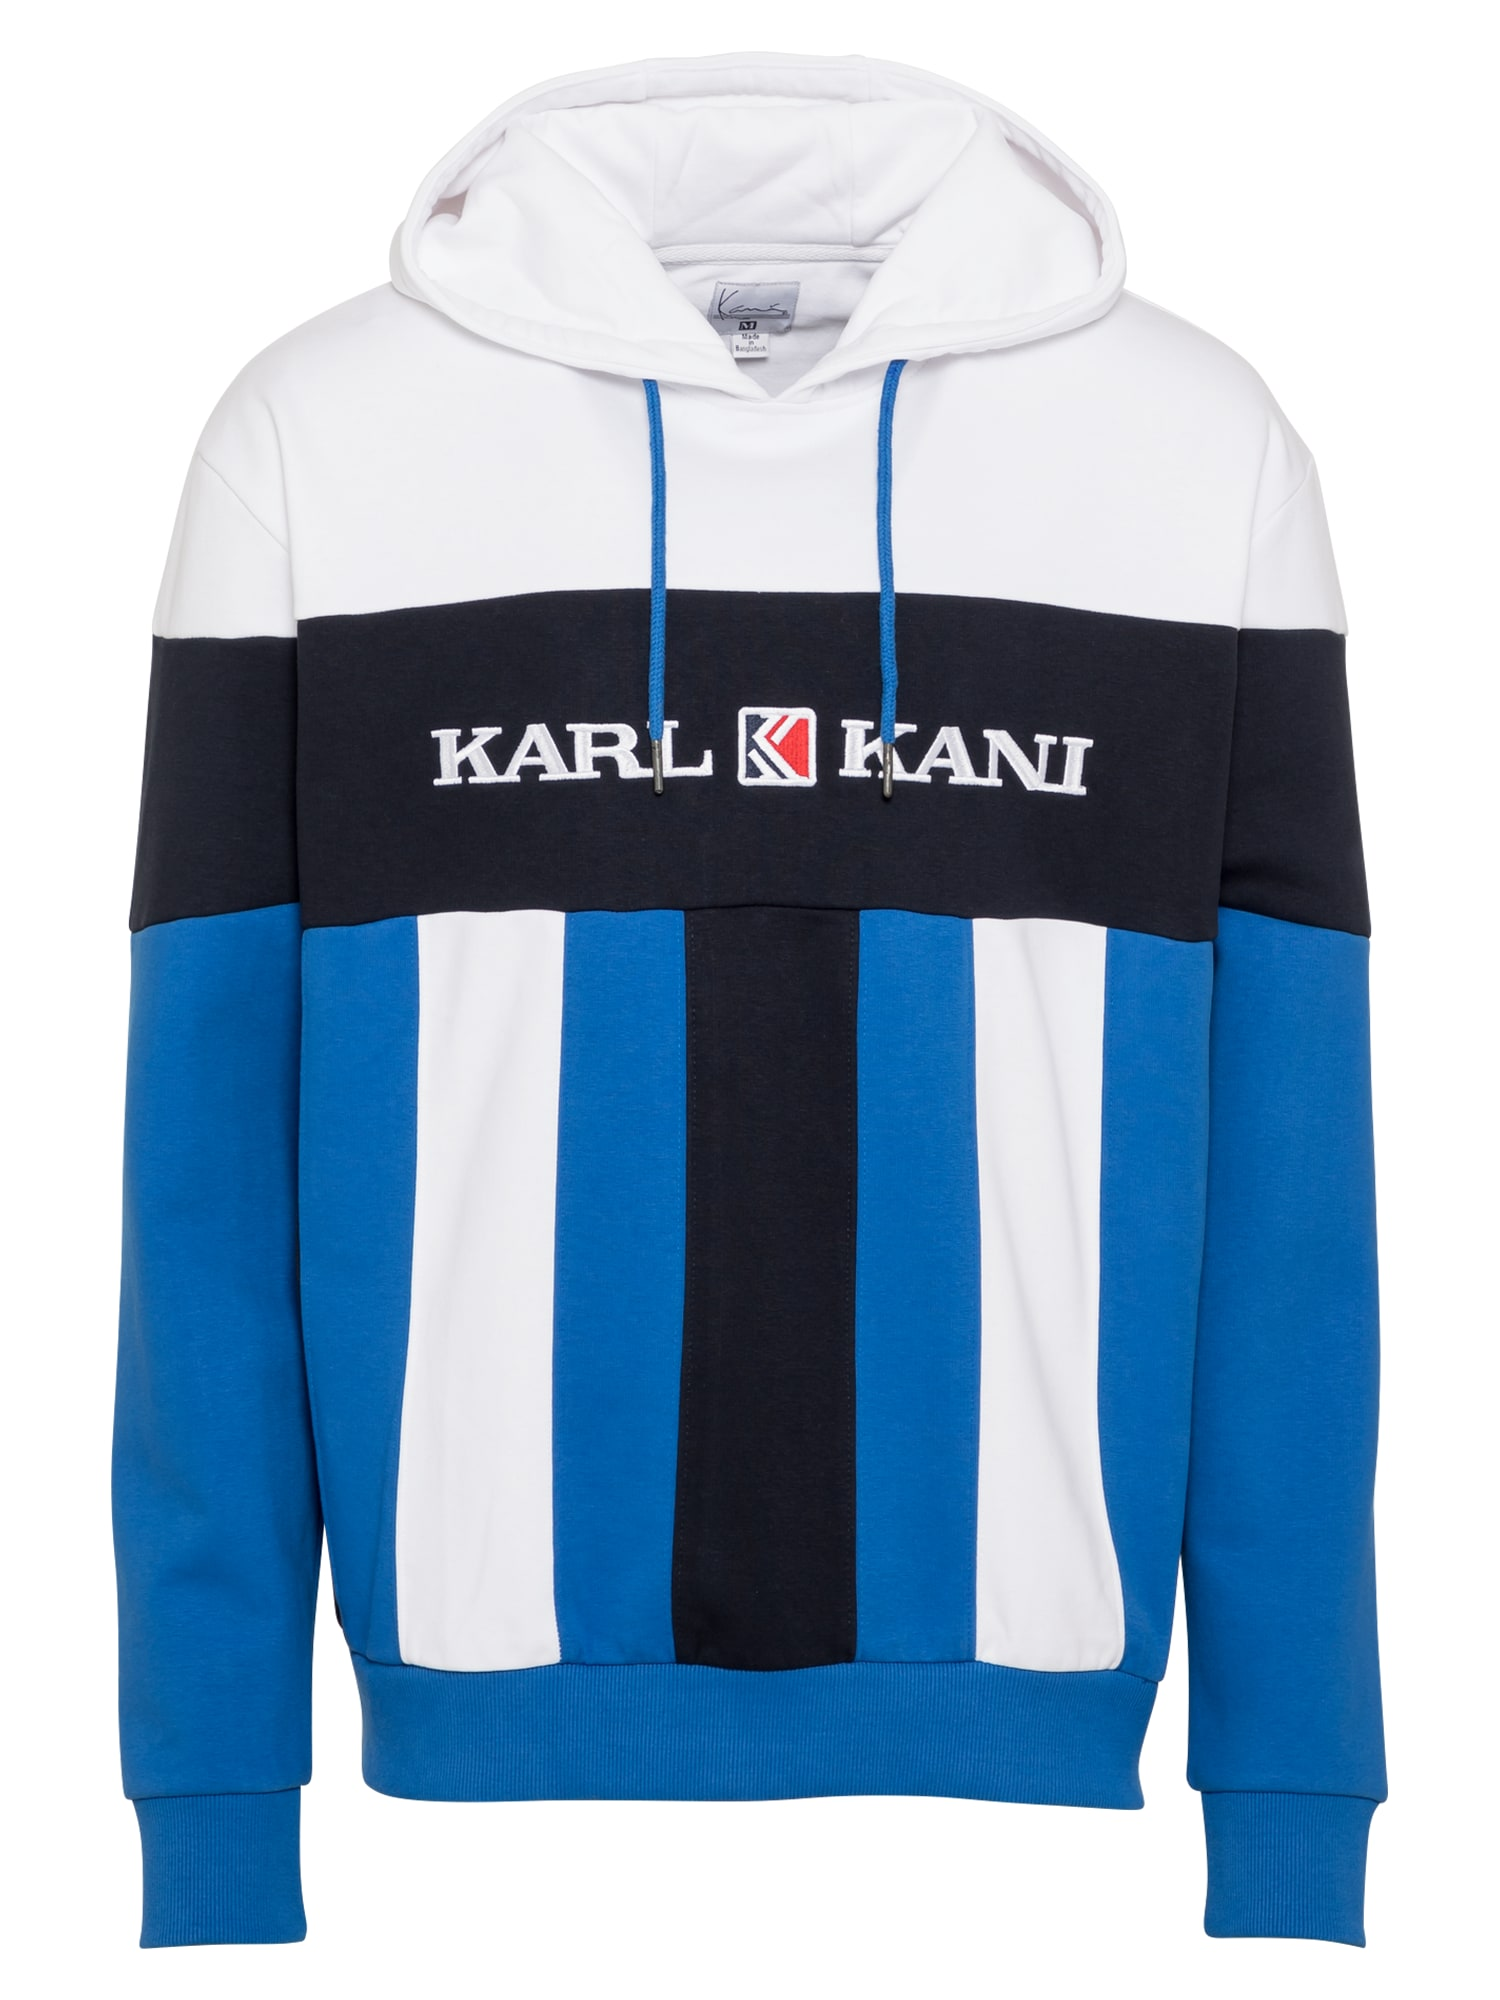 Karl Kani Megztinis be užsegimo balta / tamsiai mėlyna / mėlyna